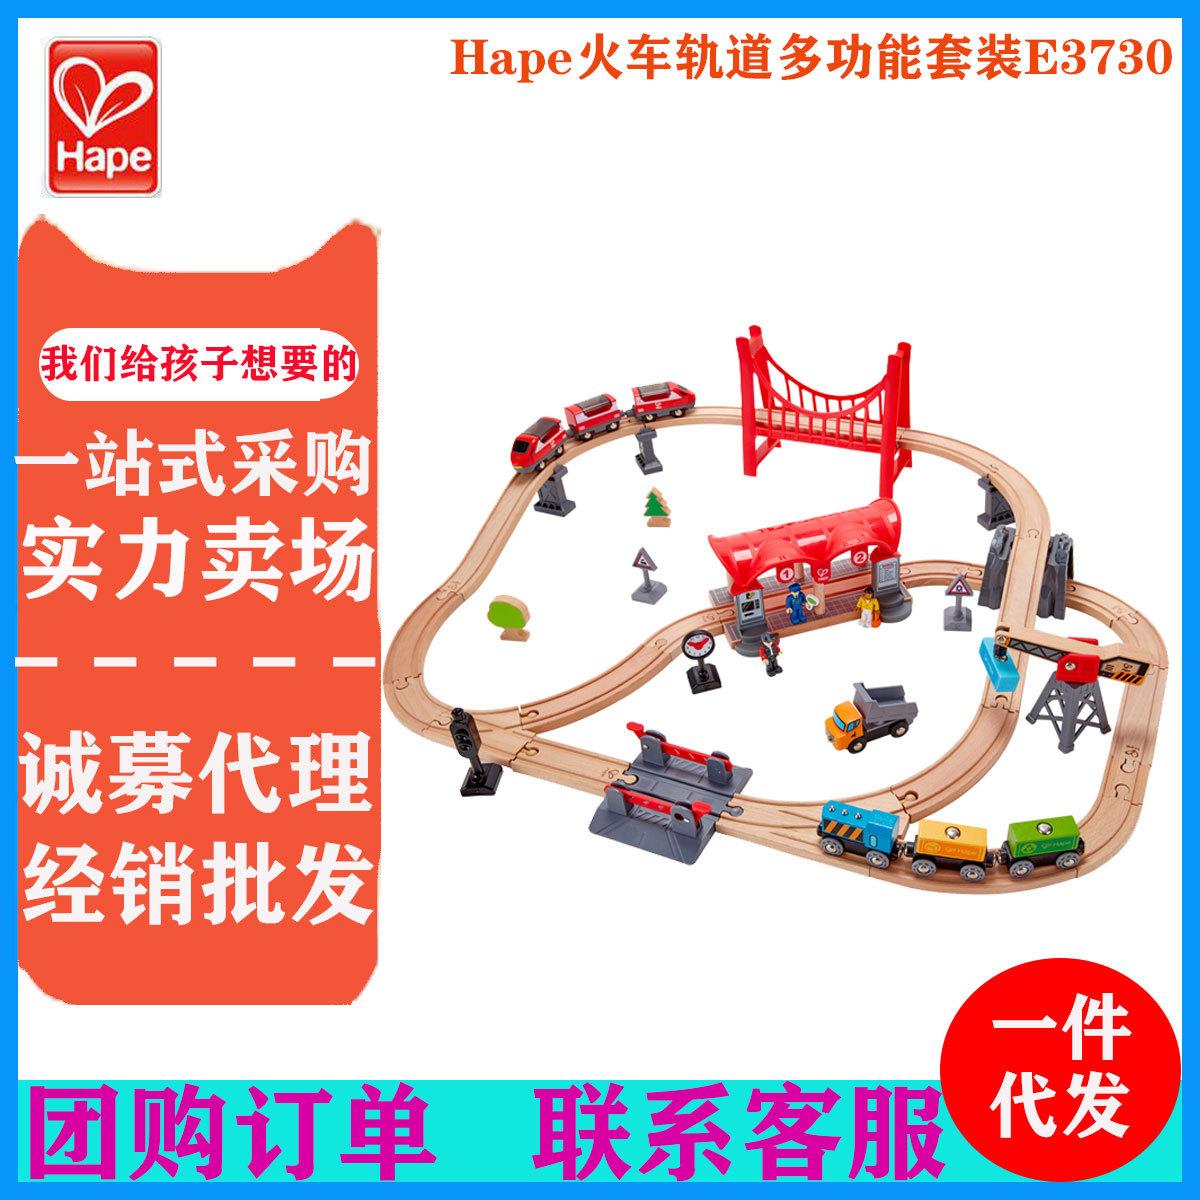 Hape火车轨道电动列车1号3岁儿童益智玩具宝宝婴幼儿木质模型套装